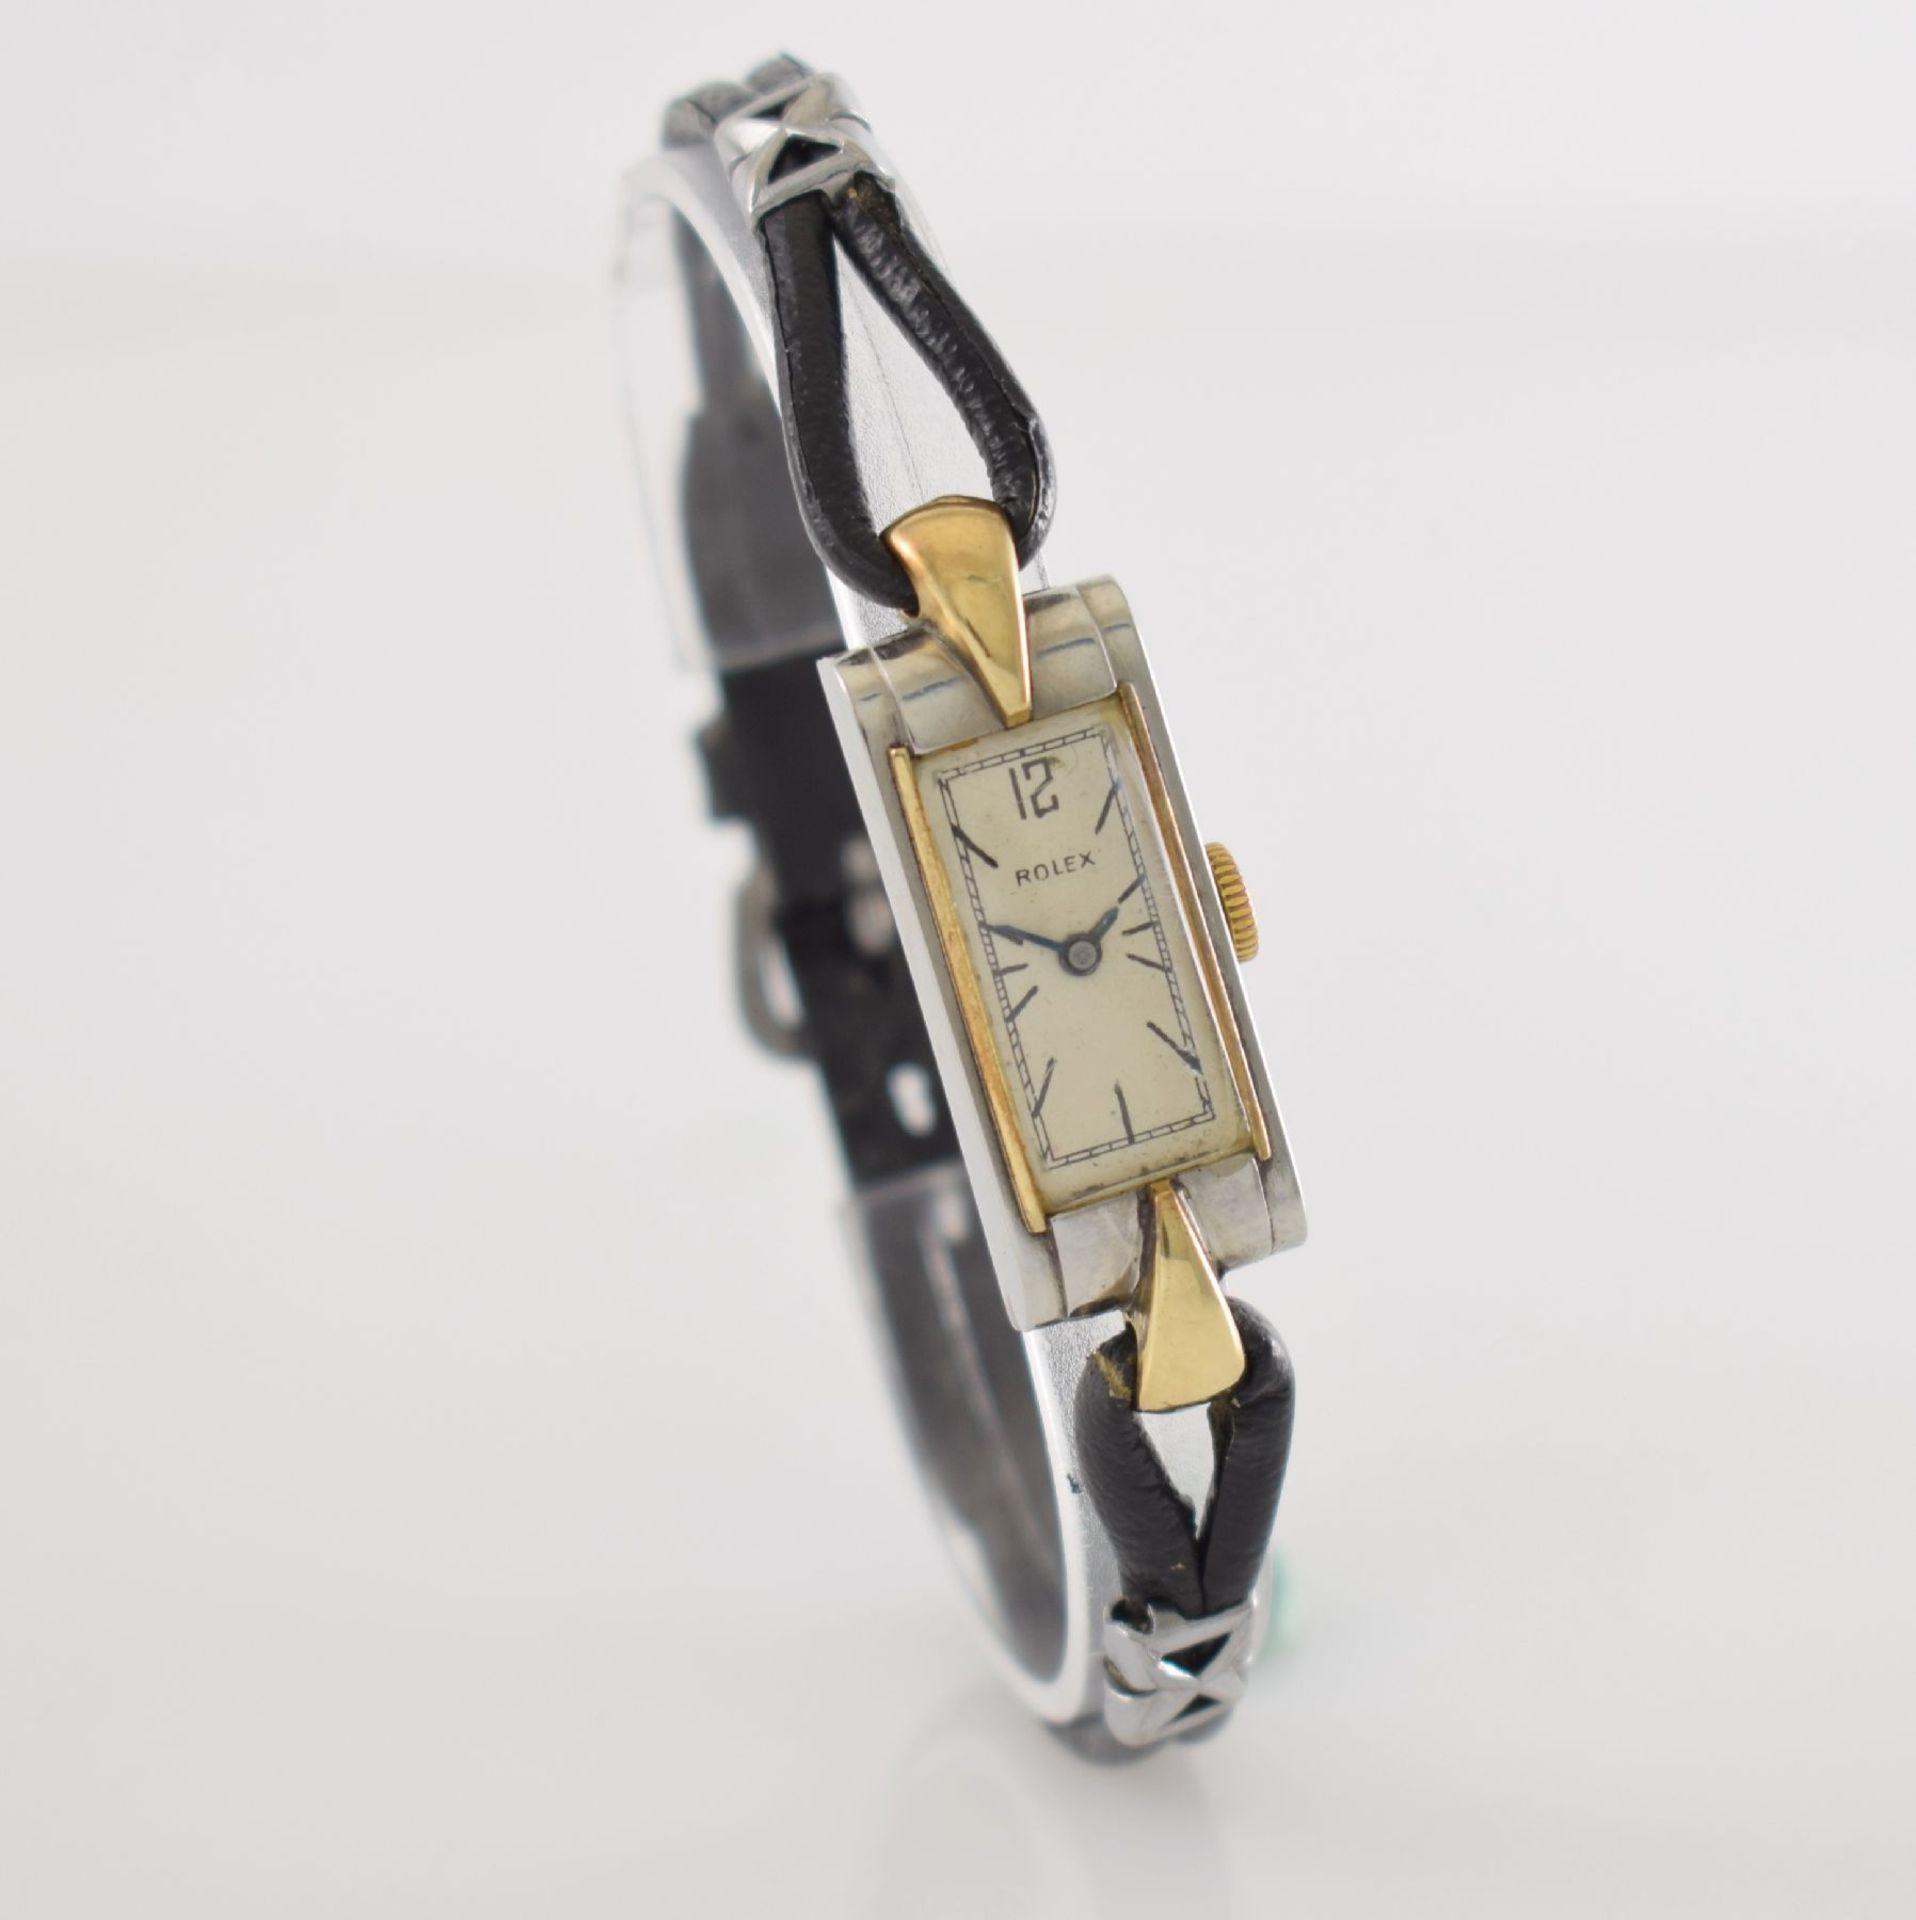 ROLEX Princess Damenarmbanduhr Ref. 1876 in Stahl/Gold, Schweiz um 1935, Handaufzug, rechteck. - Bild 5 aus 8